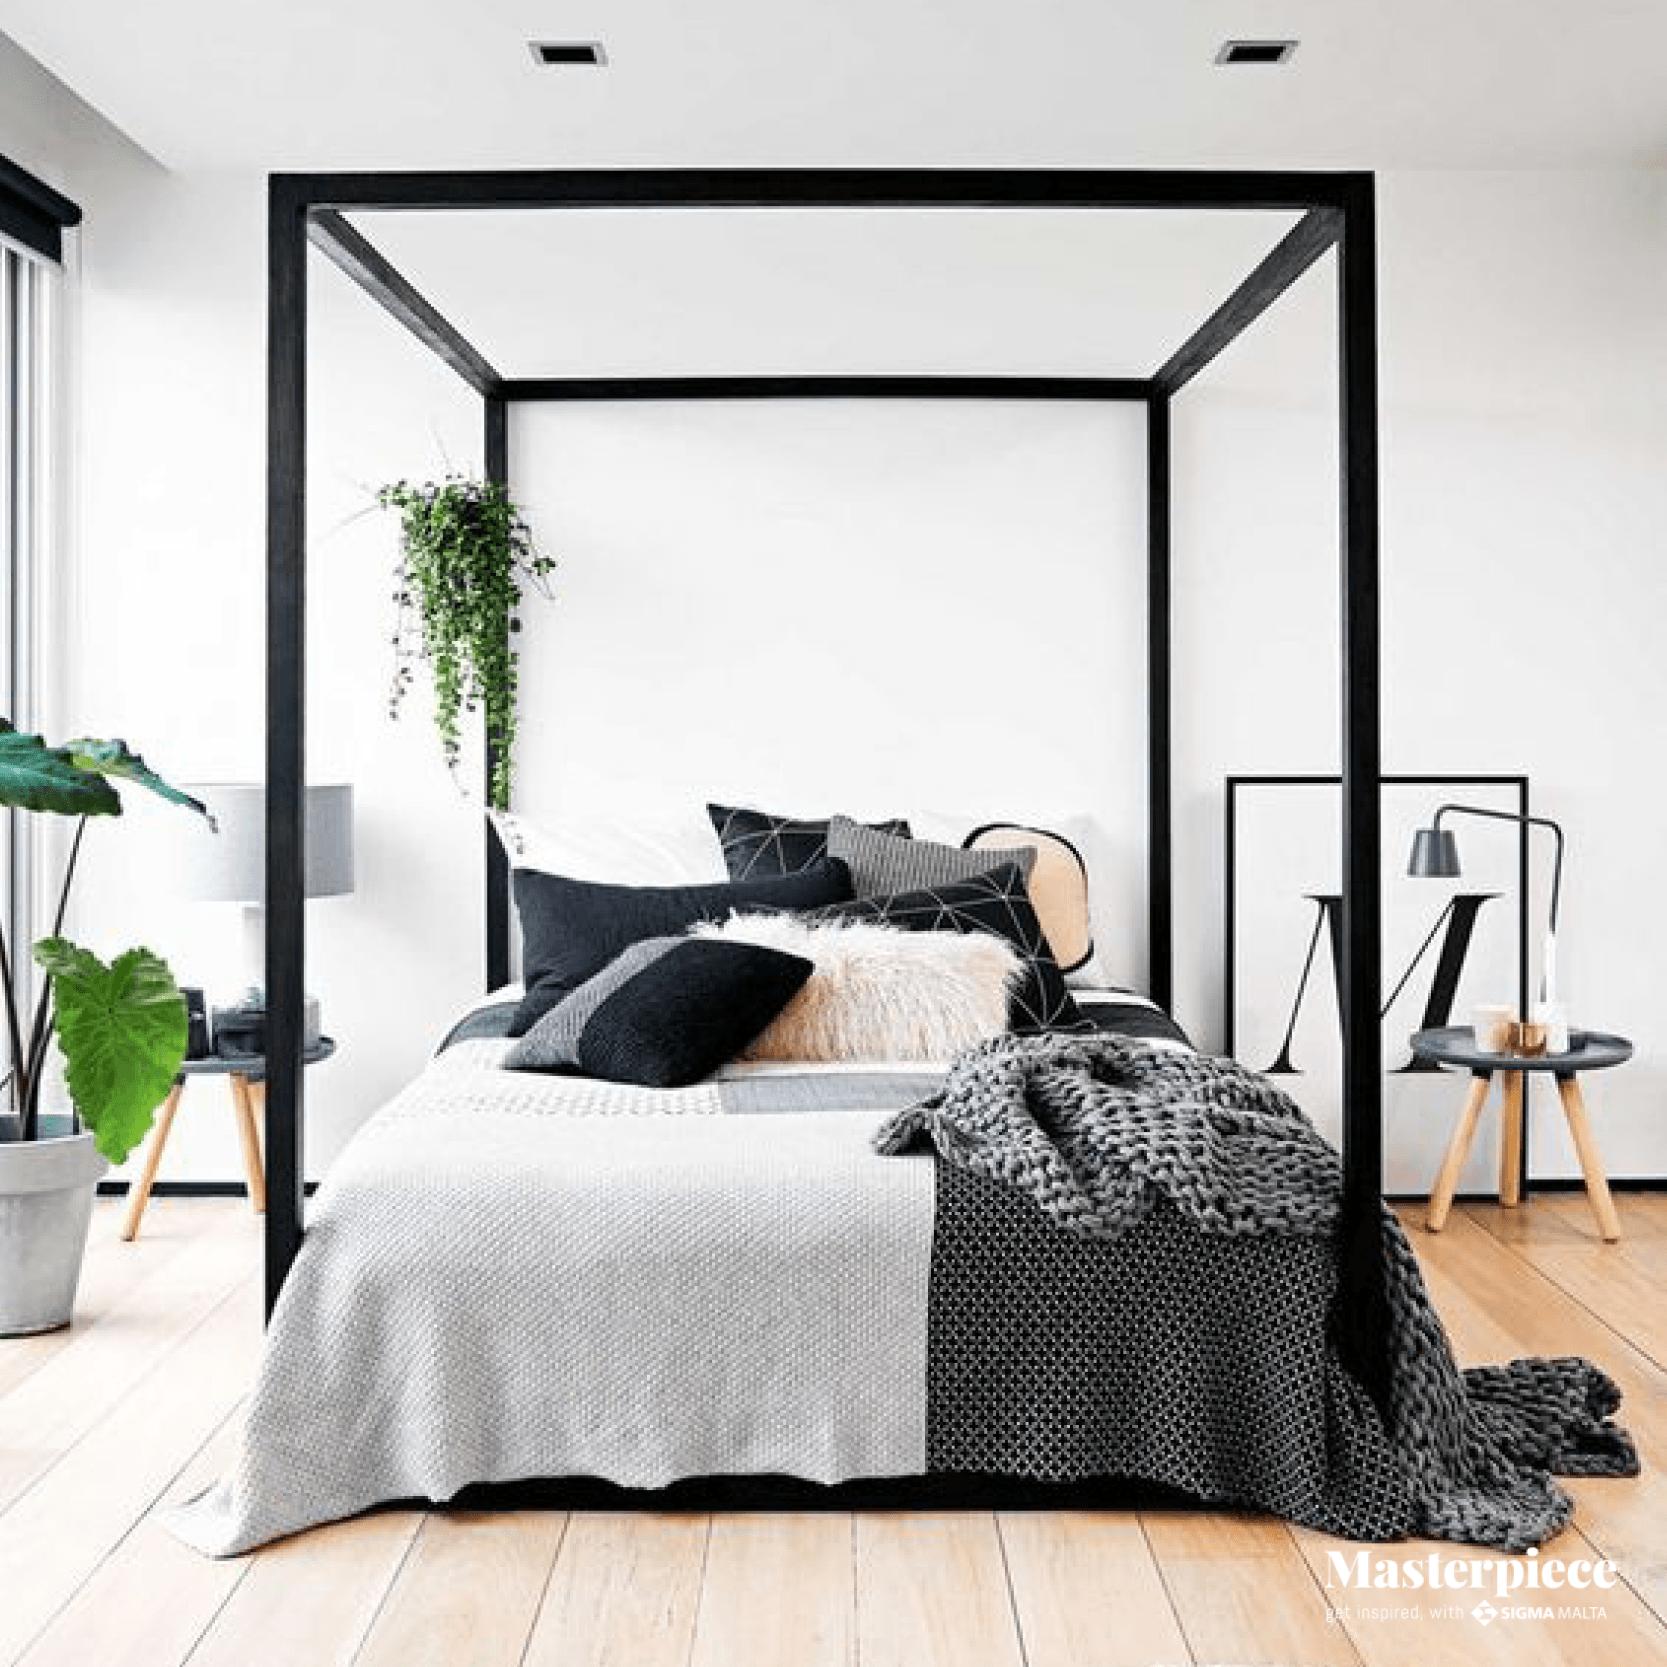 Minimalist </br><span> chic bedroom </span>